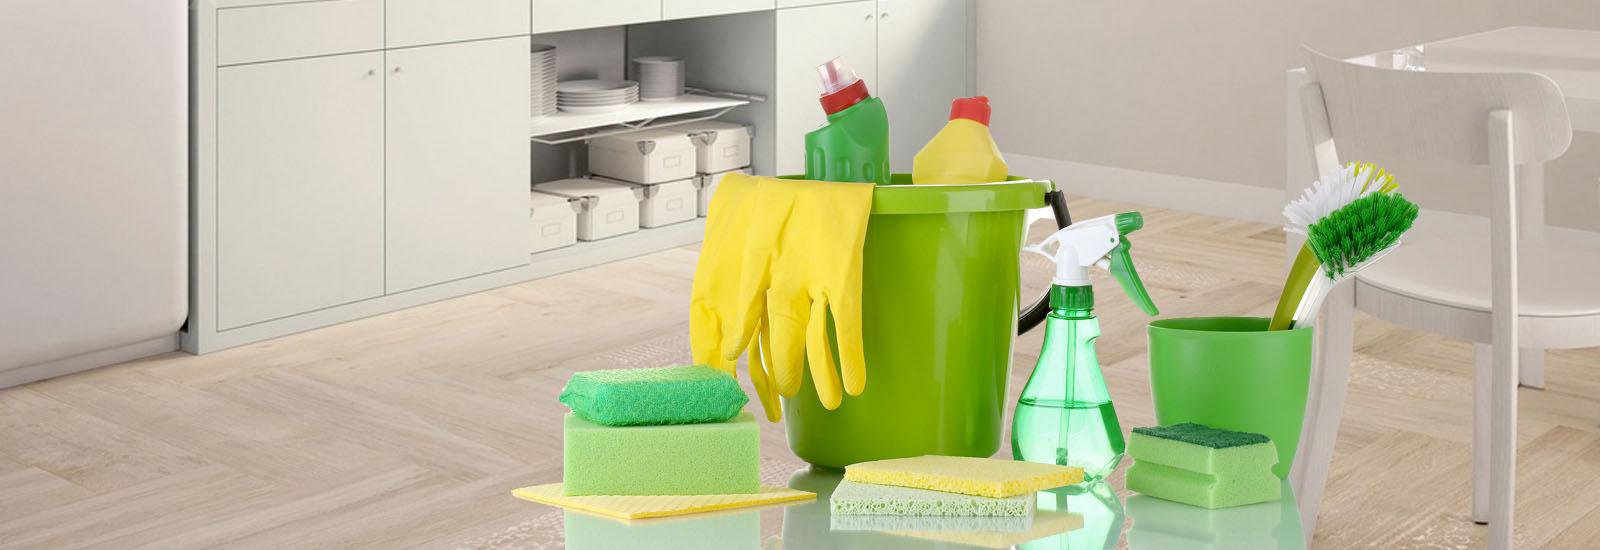 уборка сильно грязной квартиры